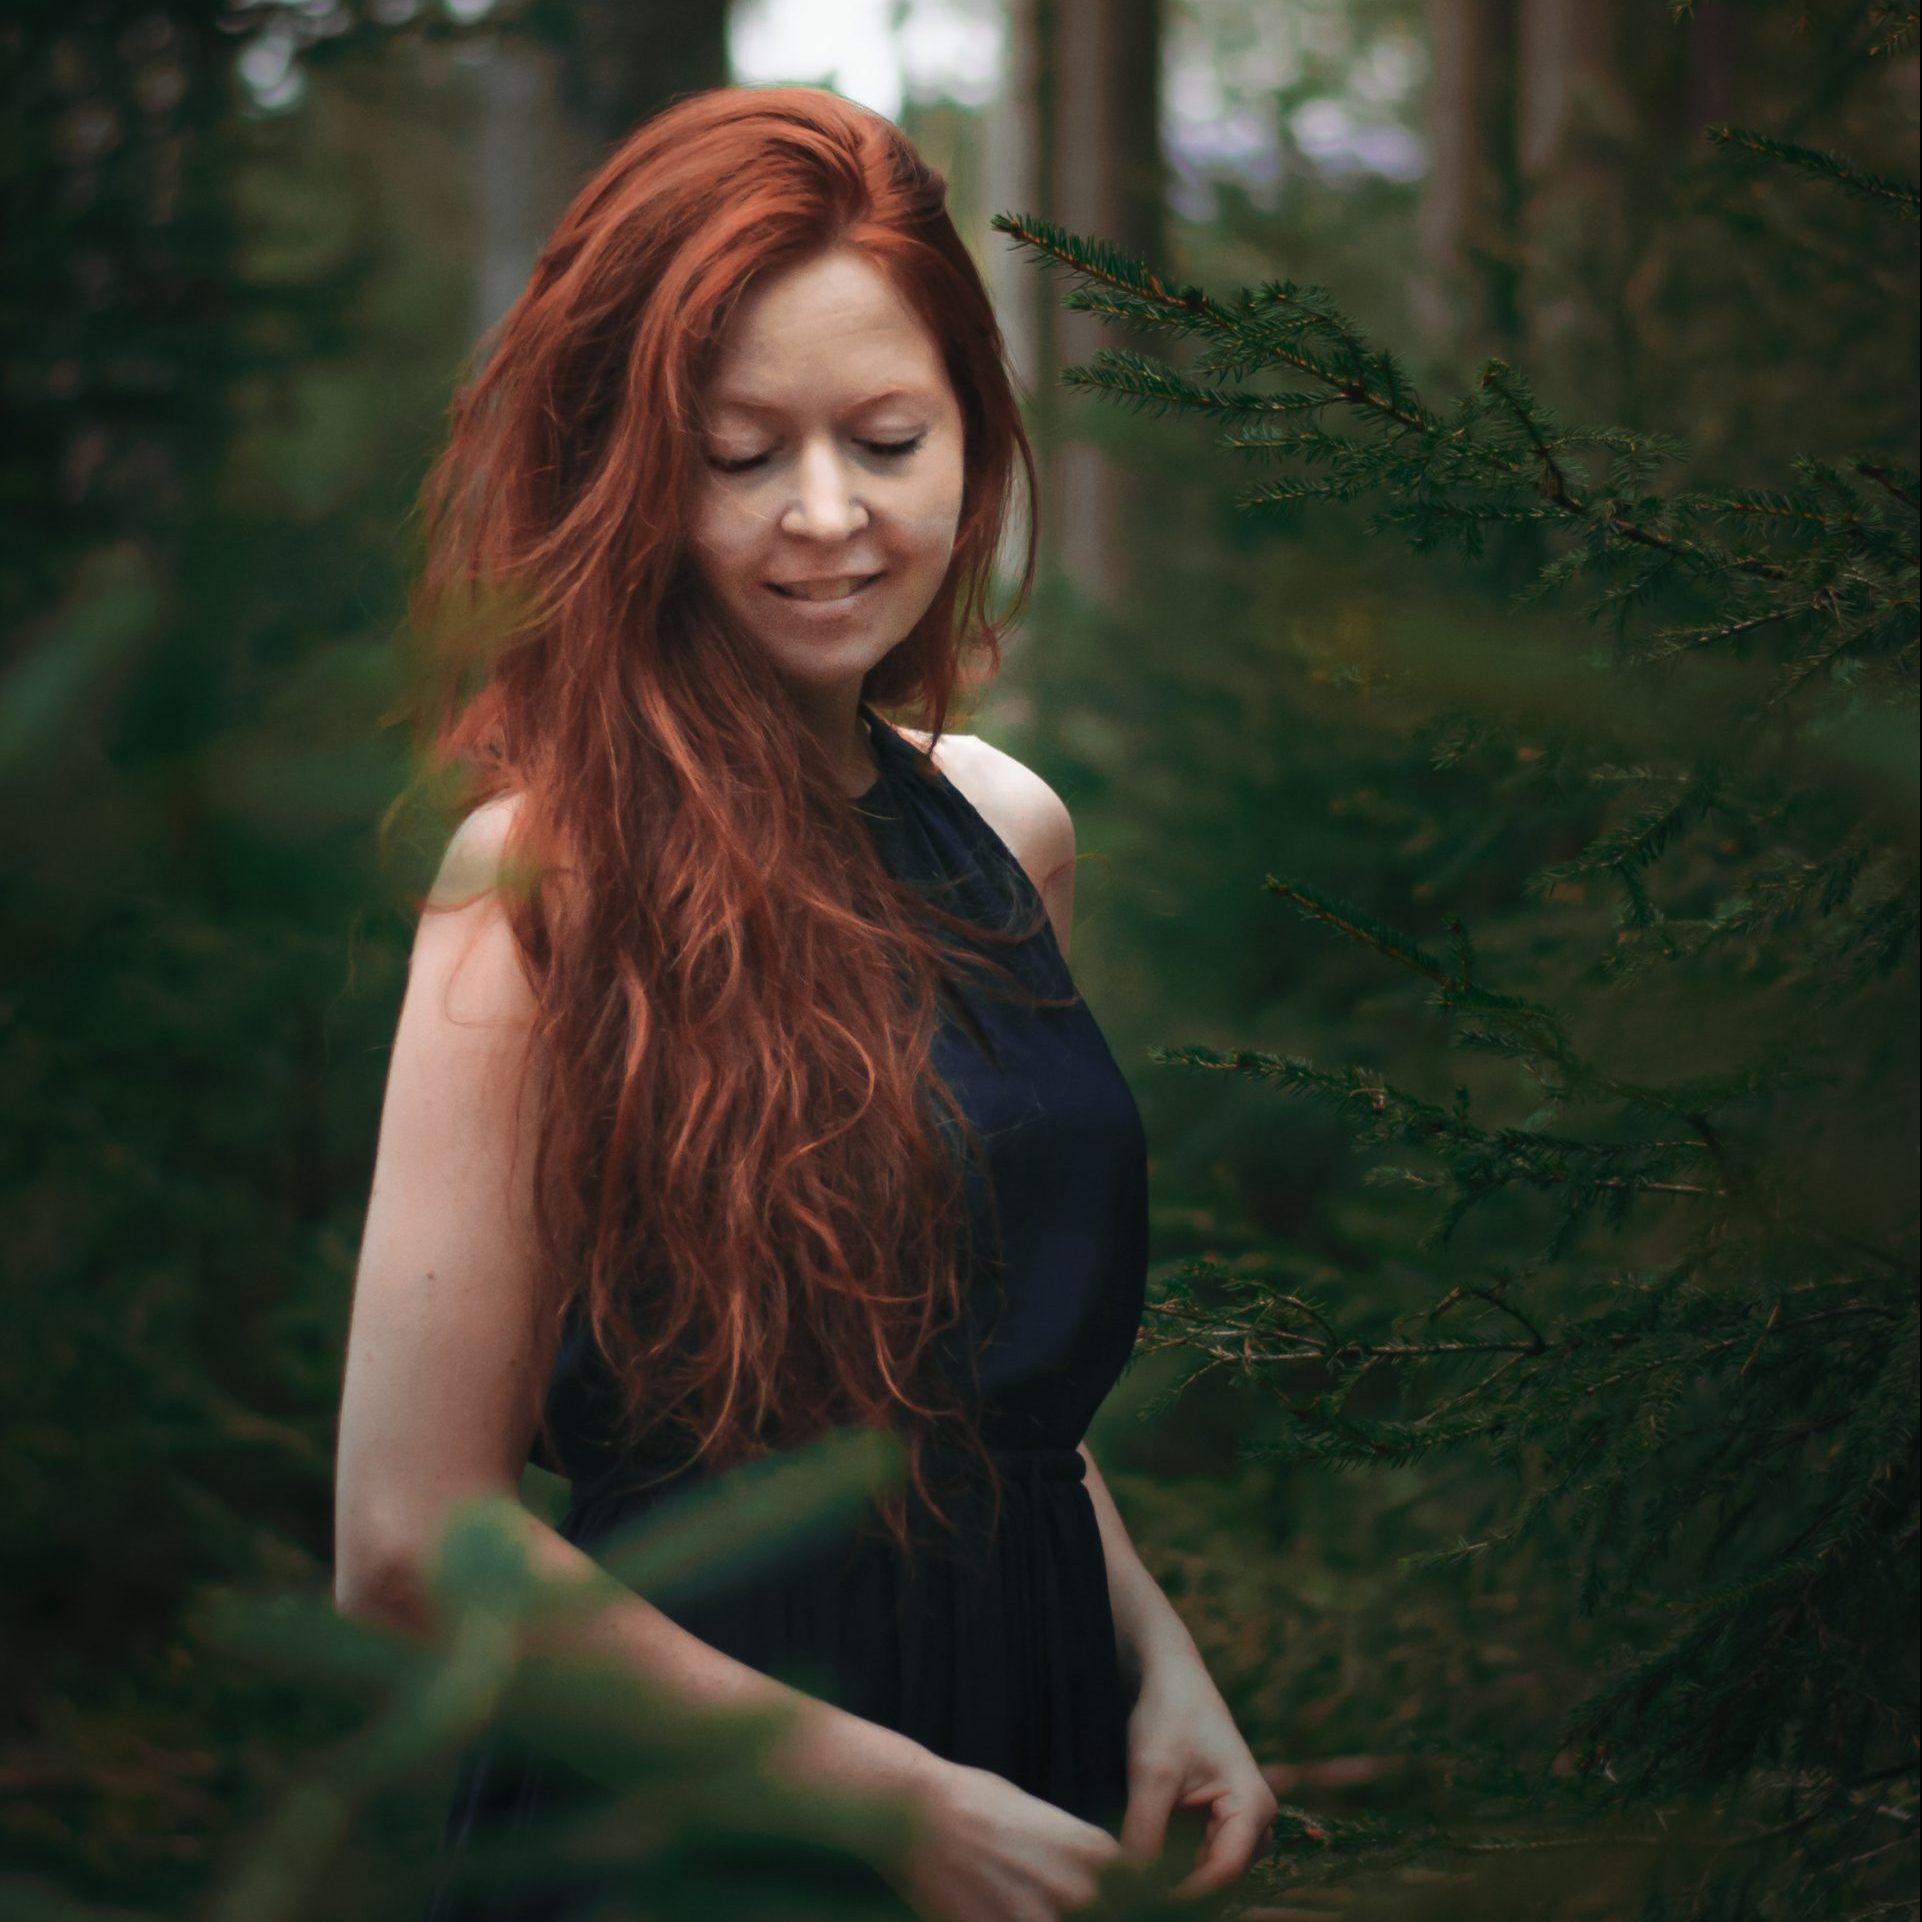 Mathilde Vissers